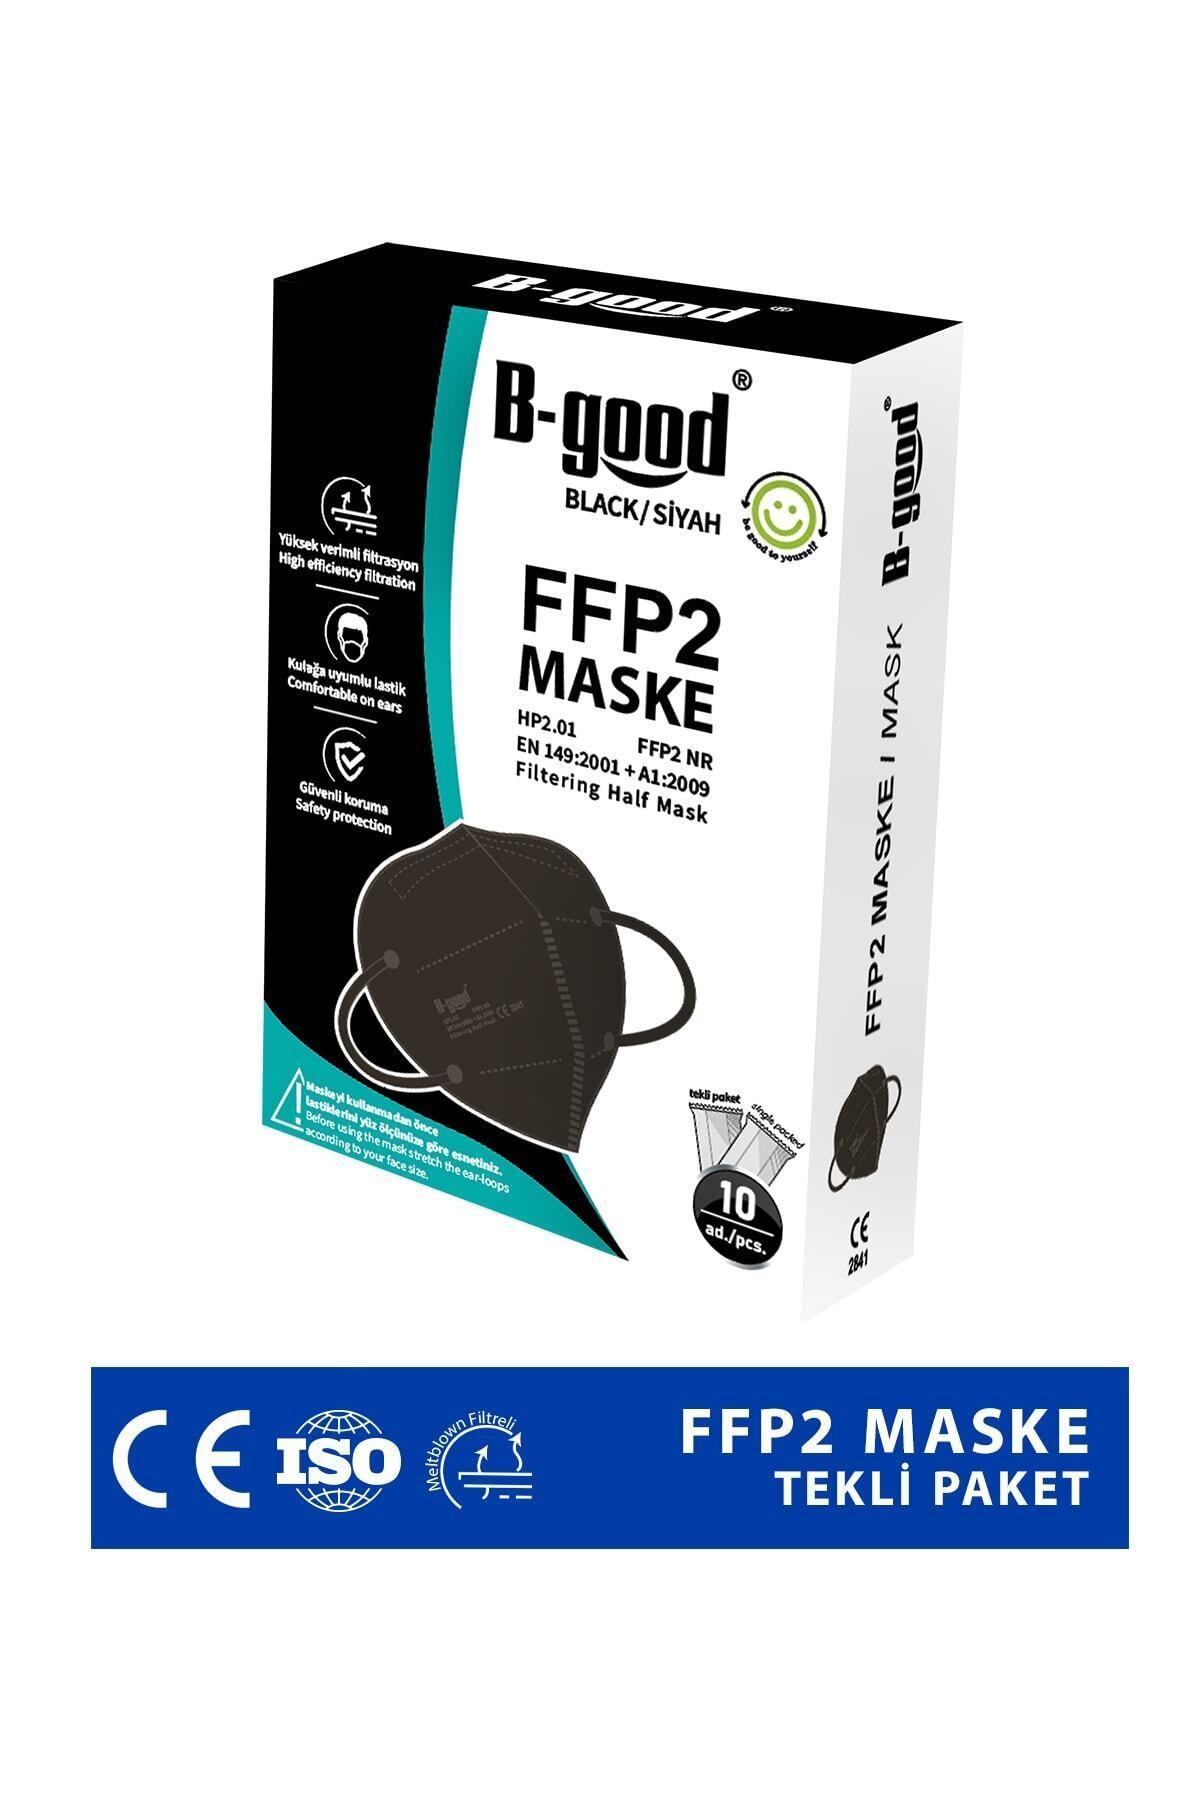 Ffp2 Tekli Paketlenmiş Siyah Koruyucu Maske 10'lu